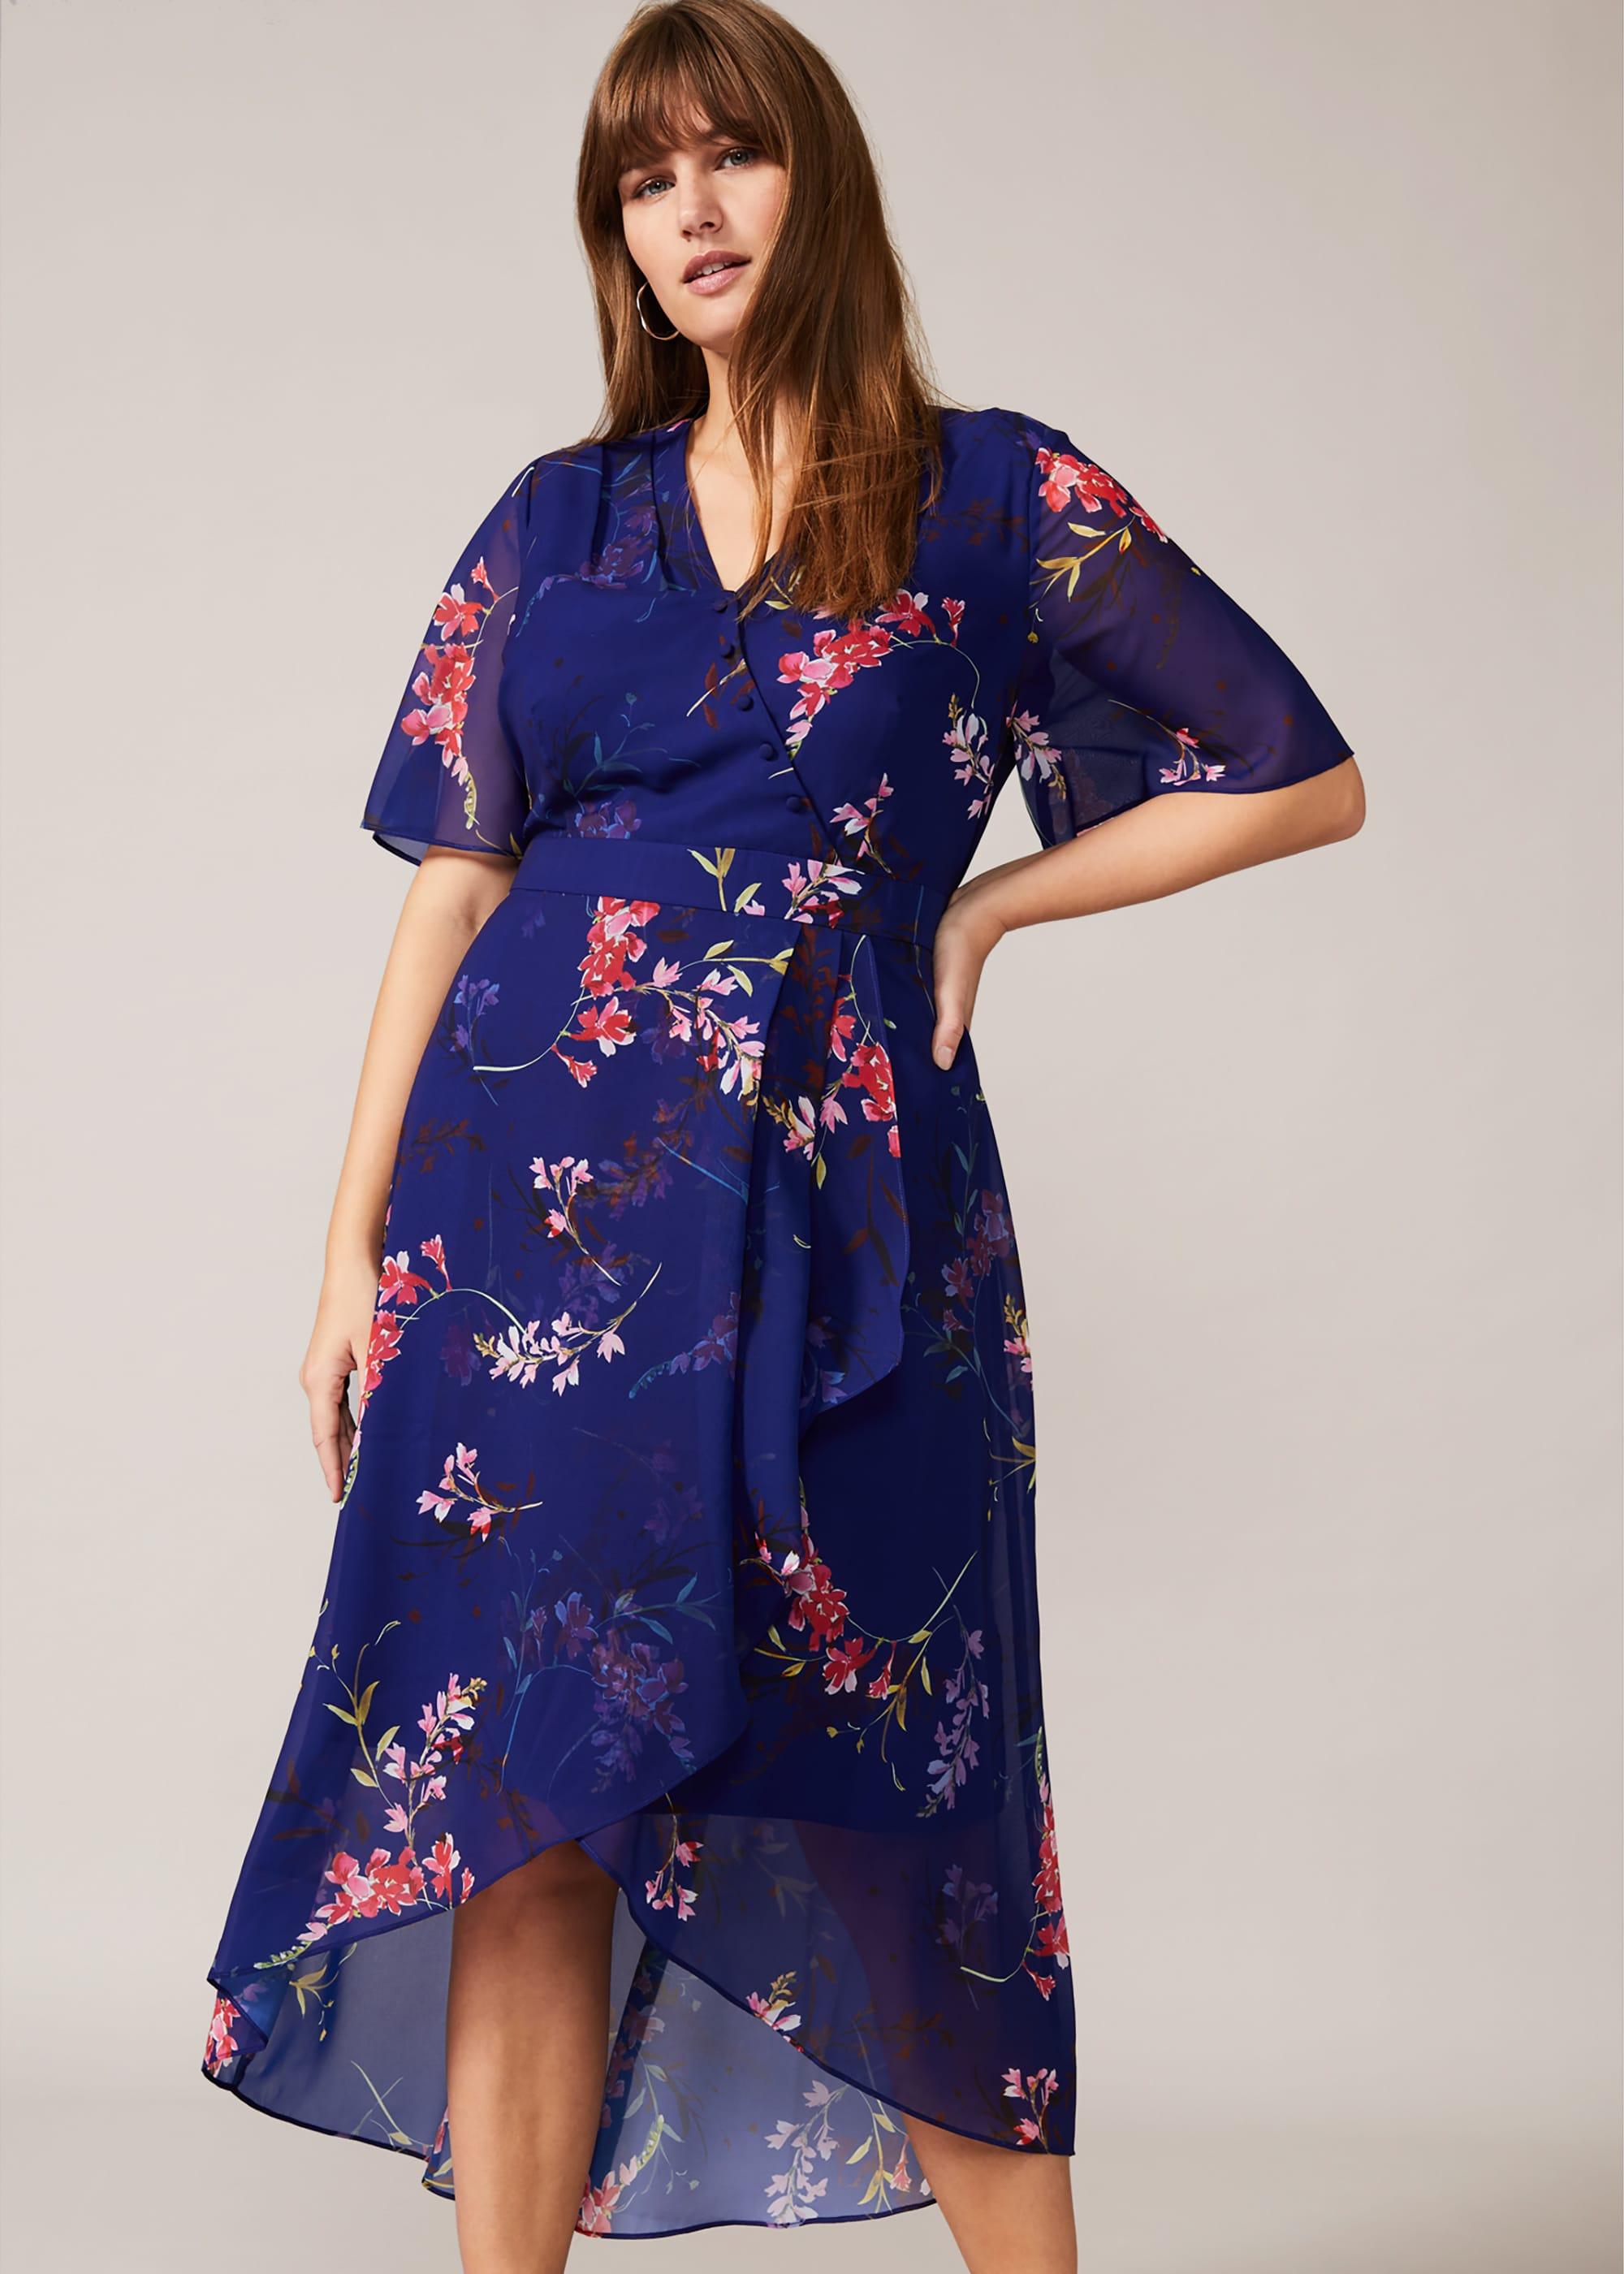 Studio 8 Women Evie Floral Tea Dress